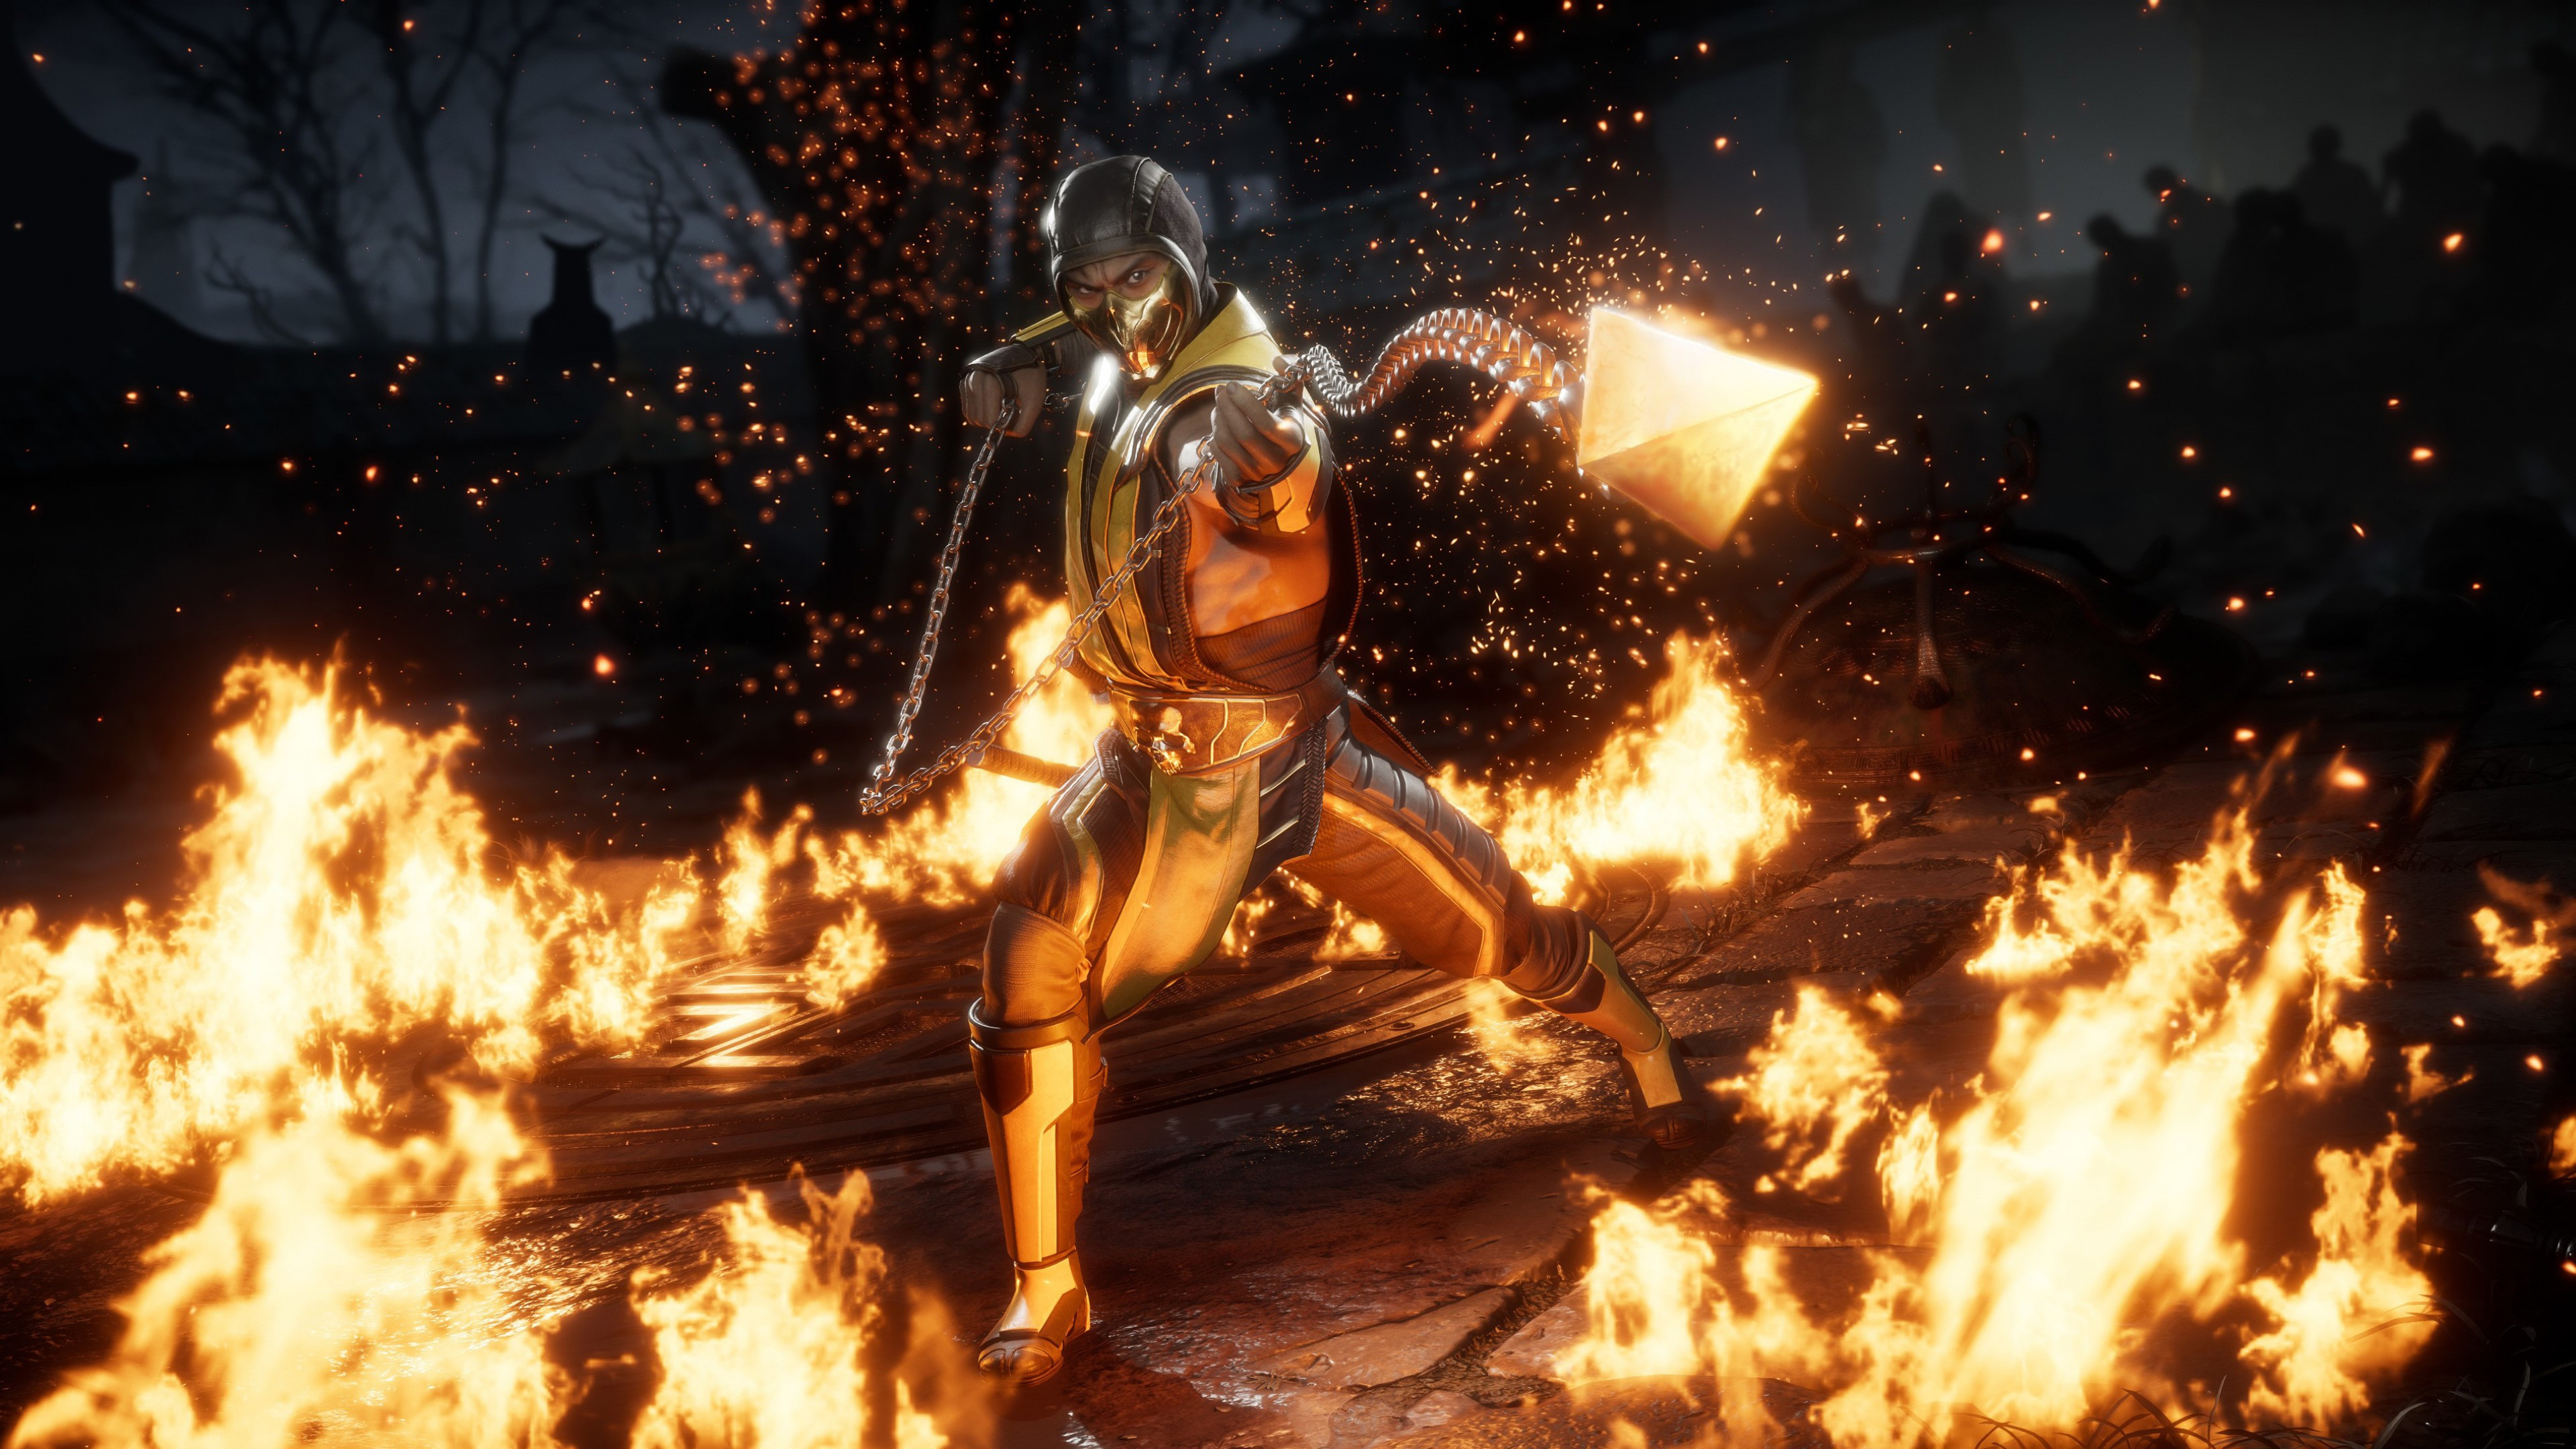 Mortal Kombat 11 Wallpapers in Ultra HD 4K   Gameranx 3840x2160